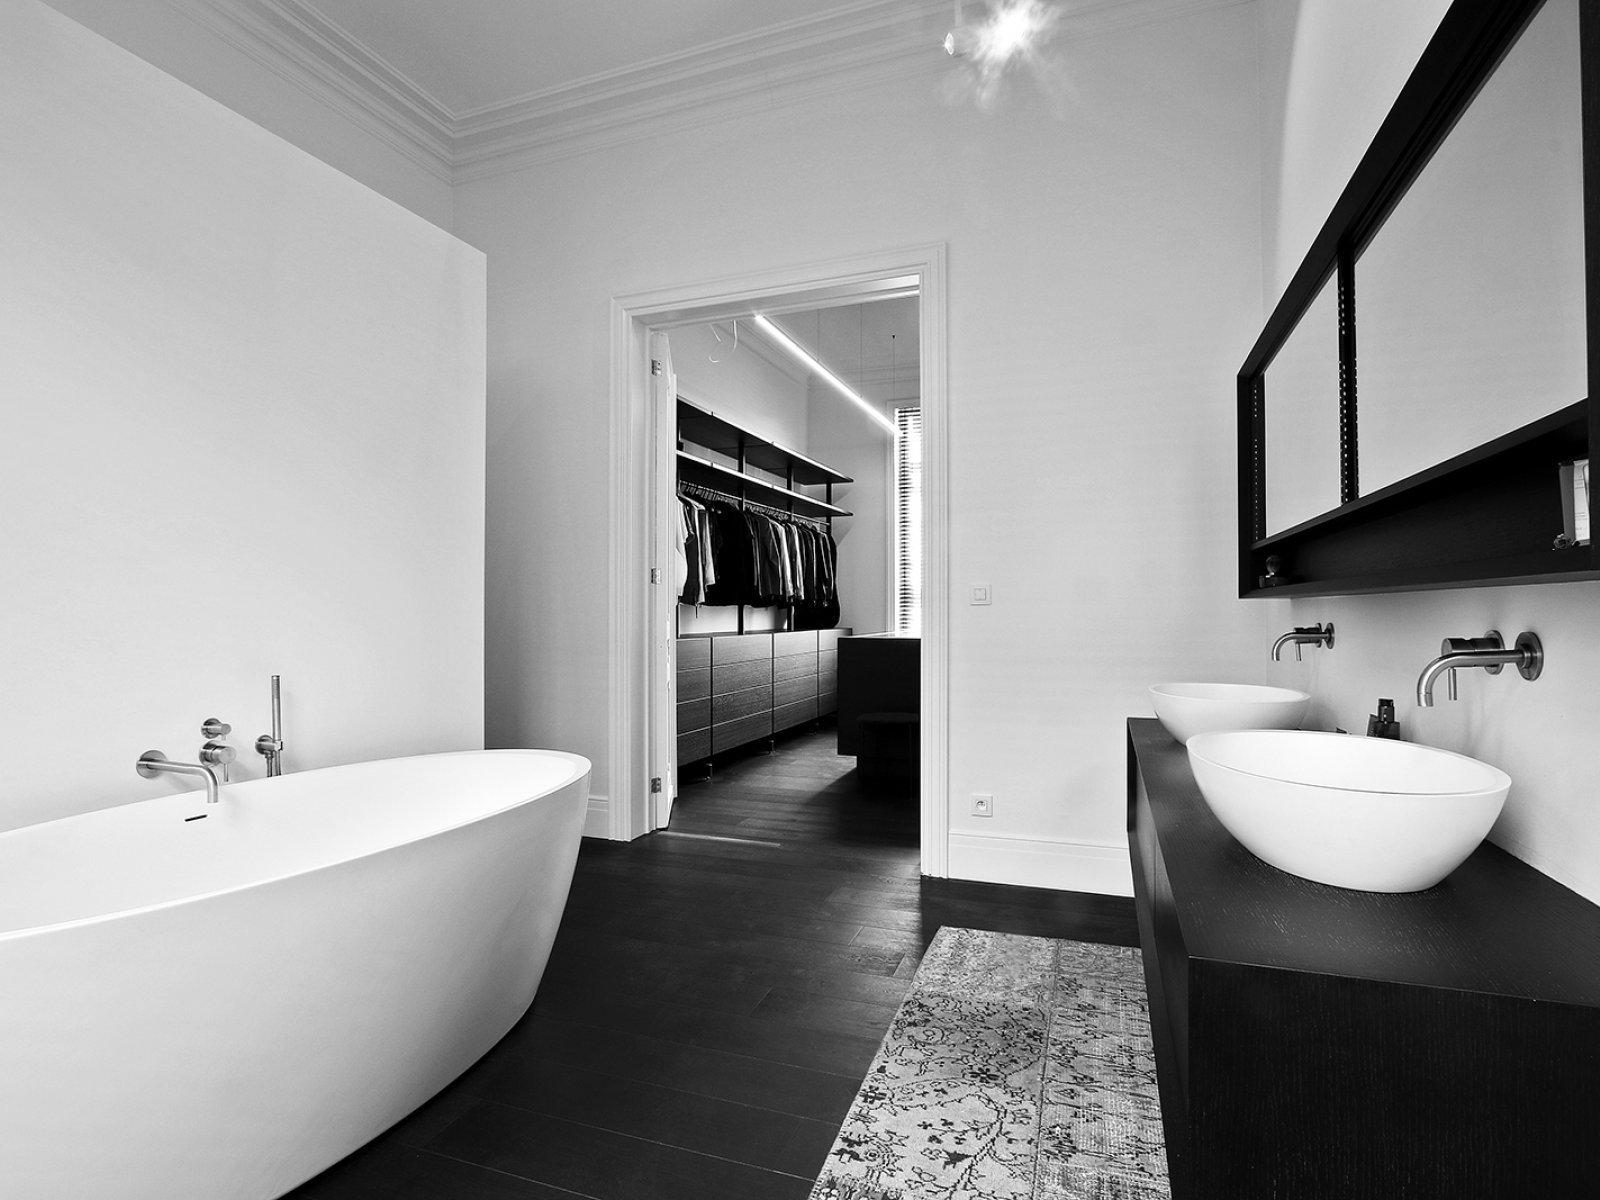 Stijlvolle badkamer